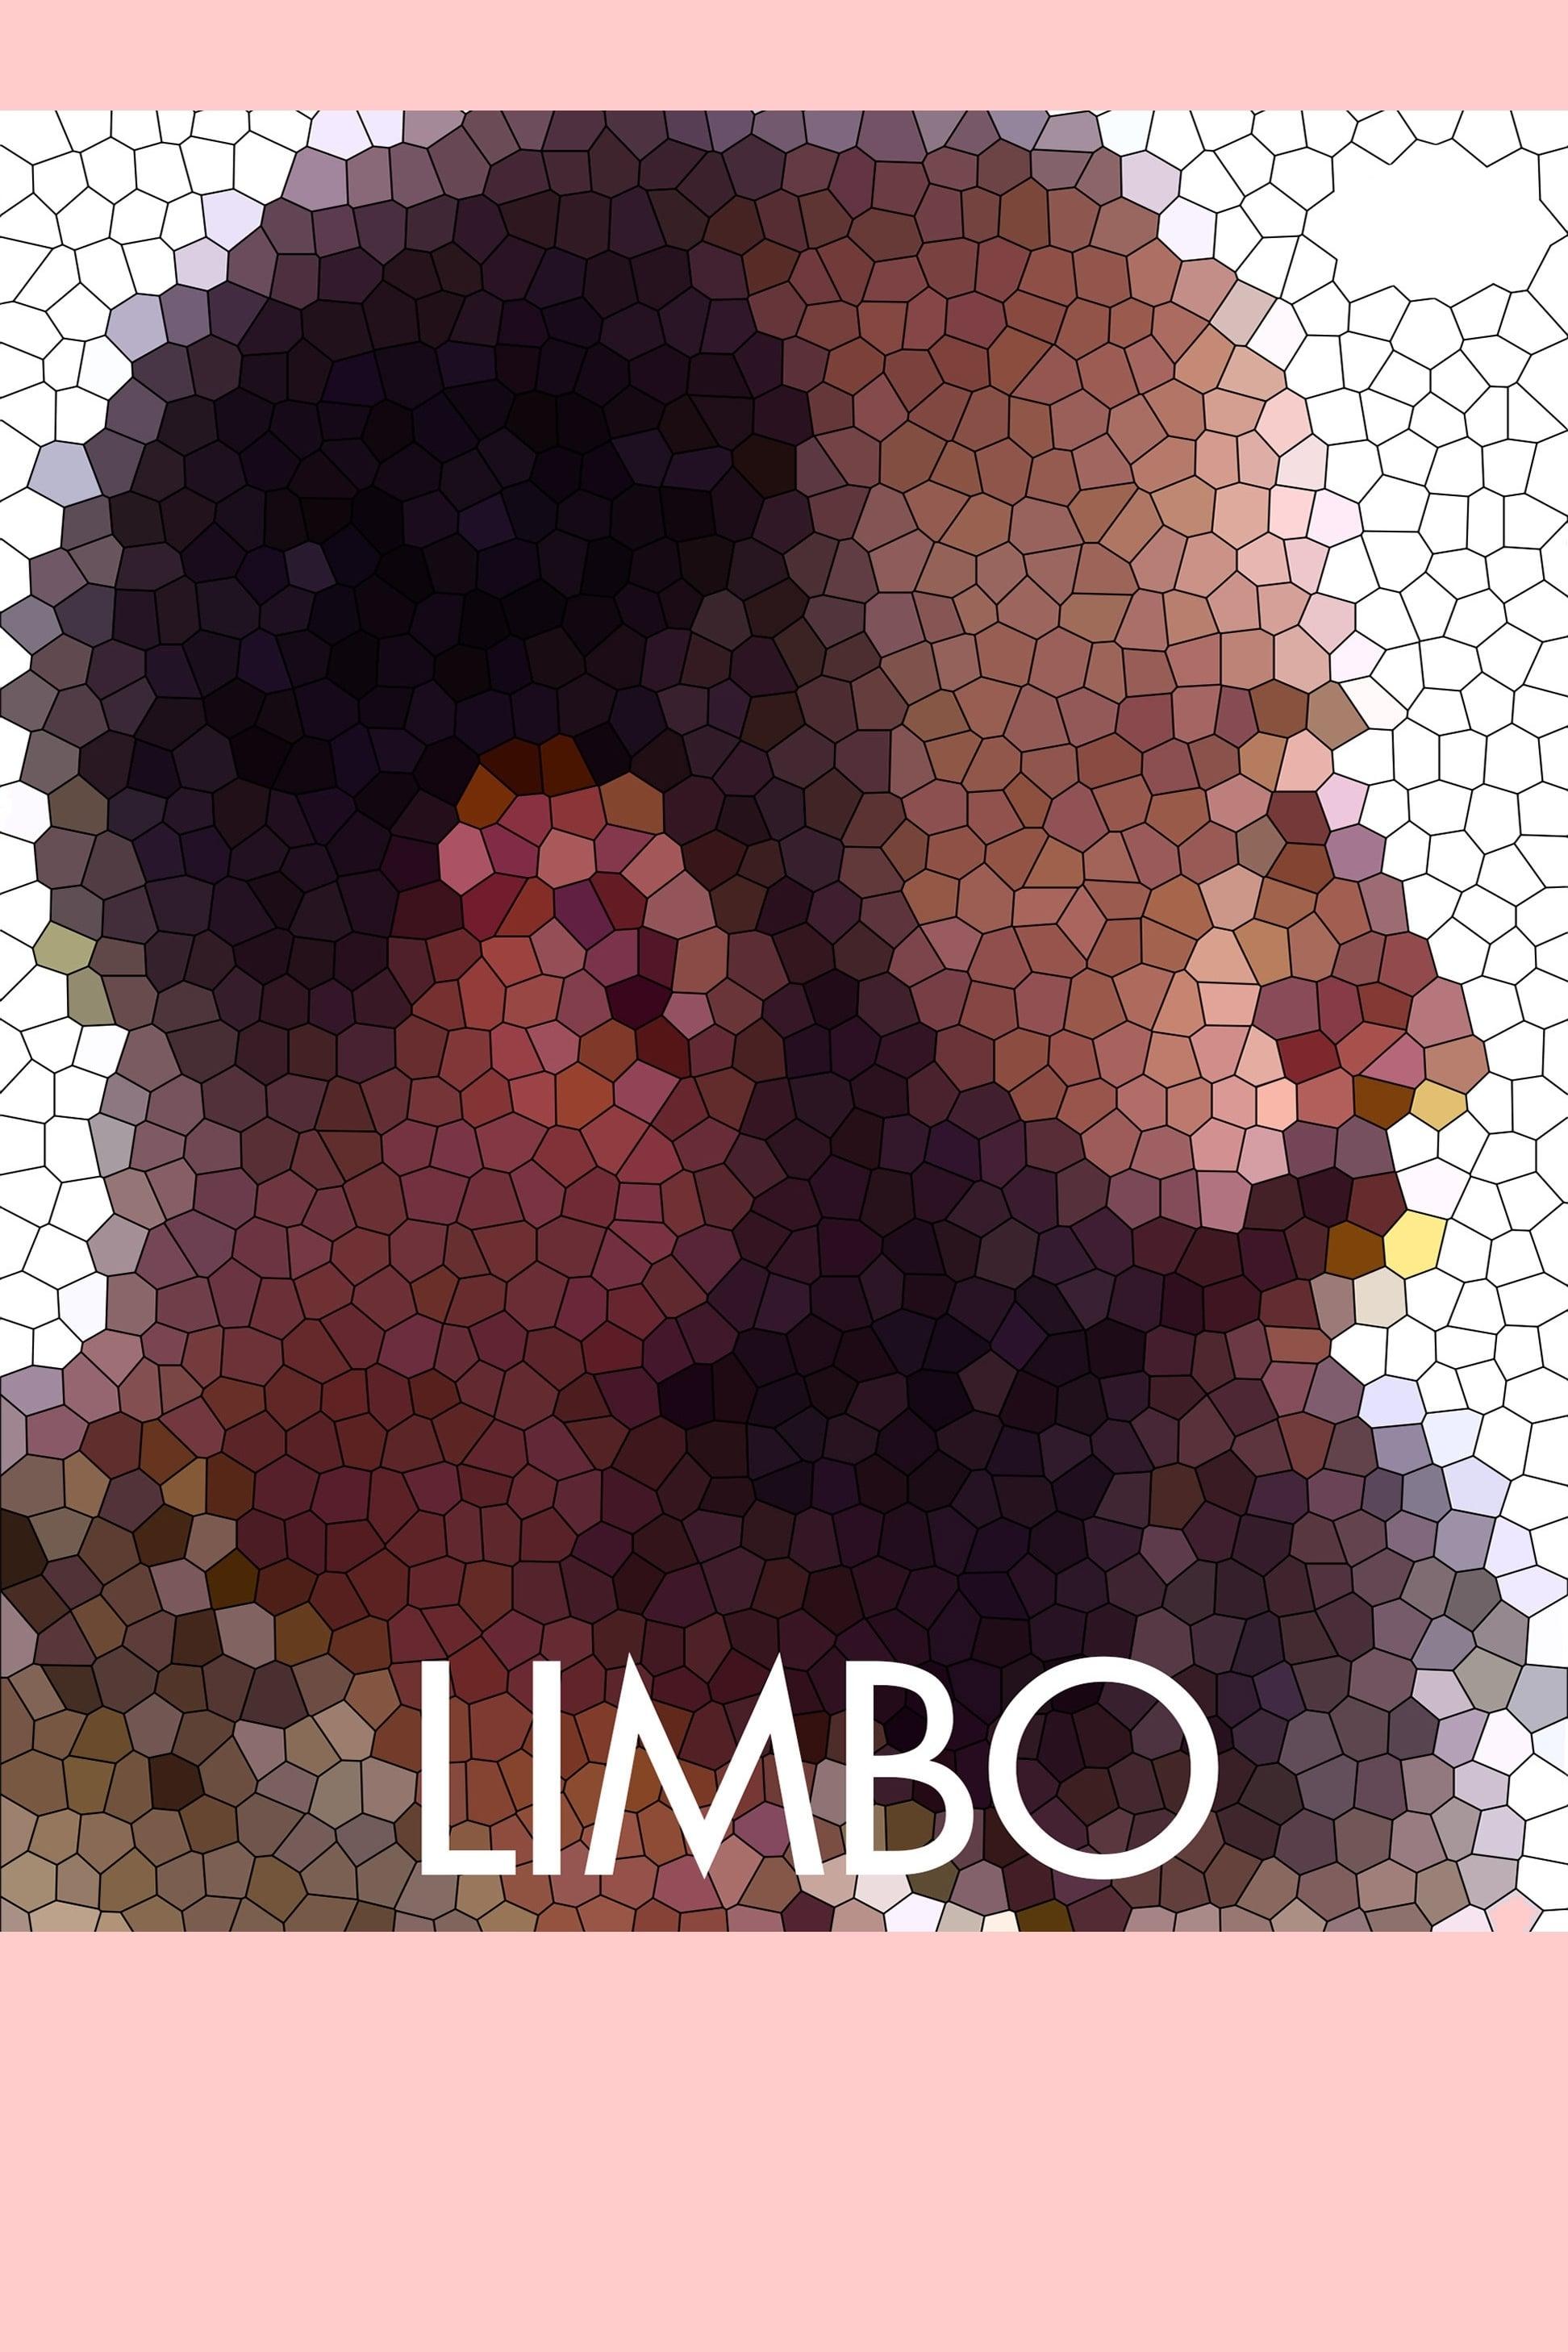 Limbo (2015)